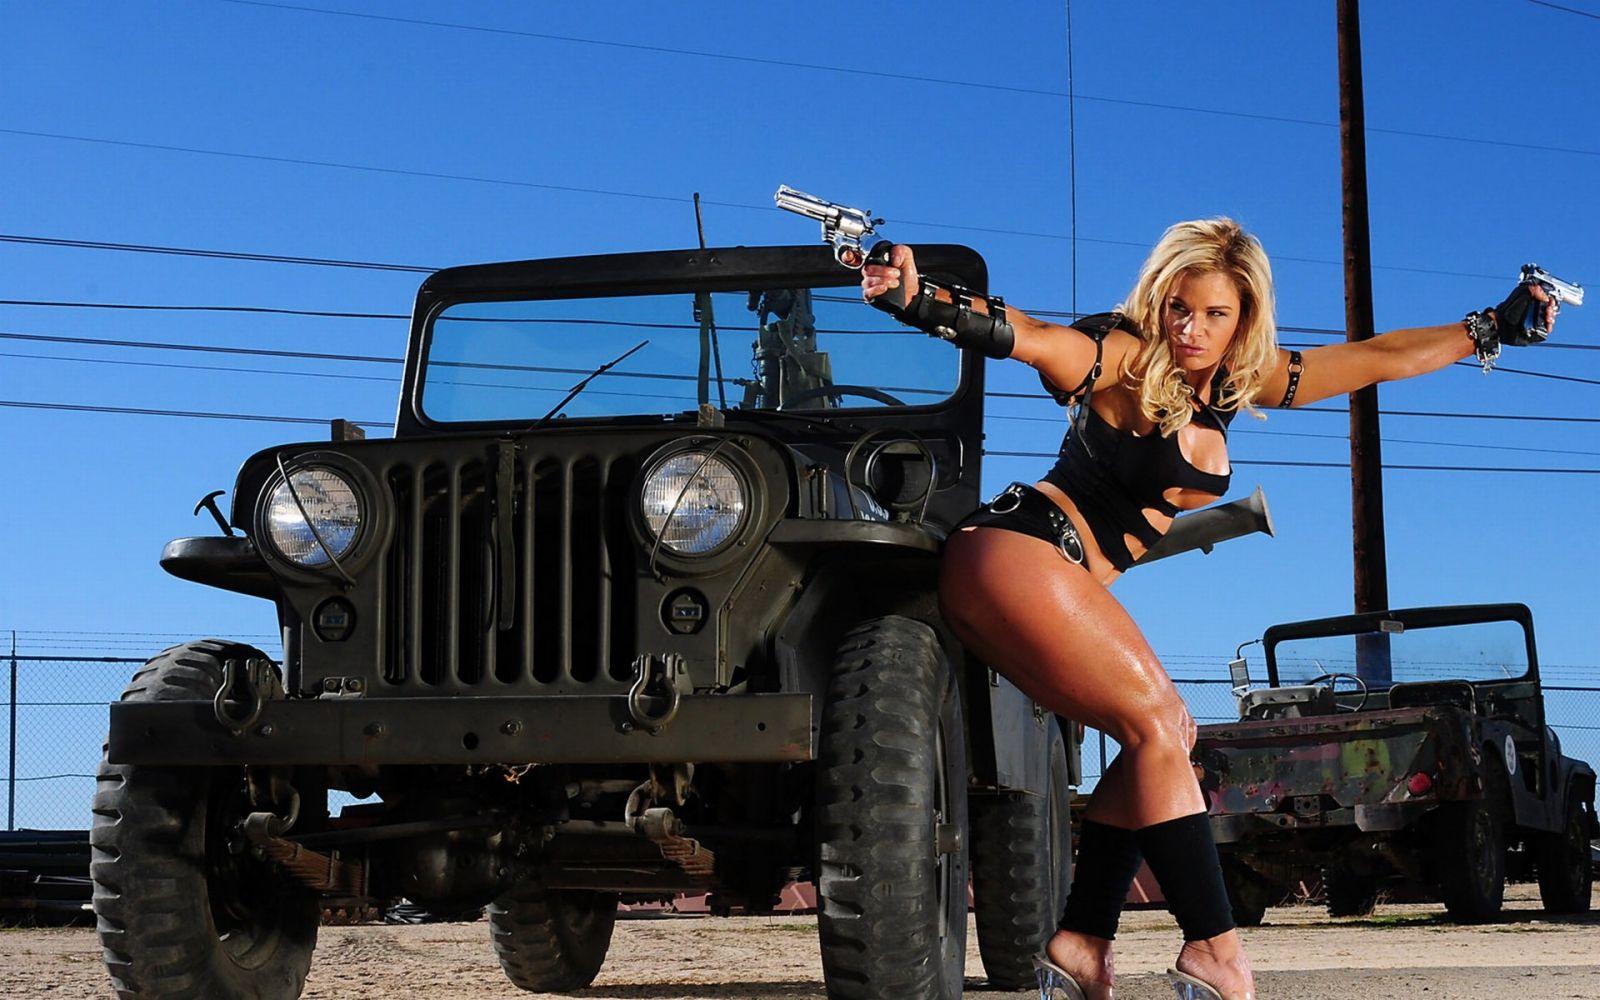 Kapoor naked gun car